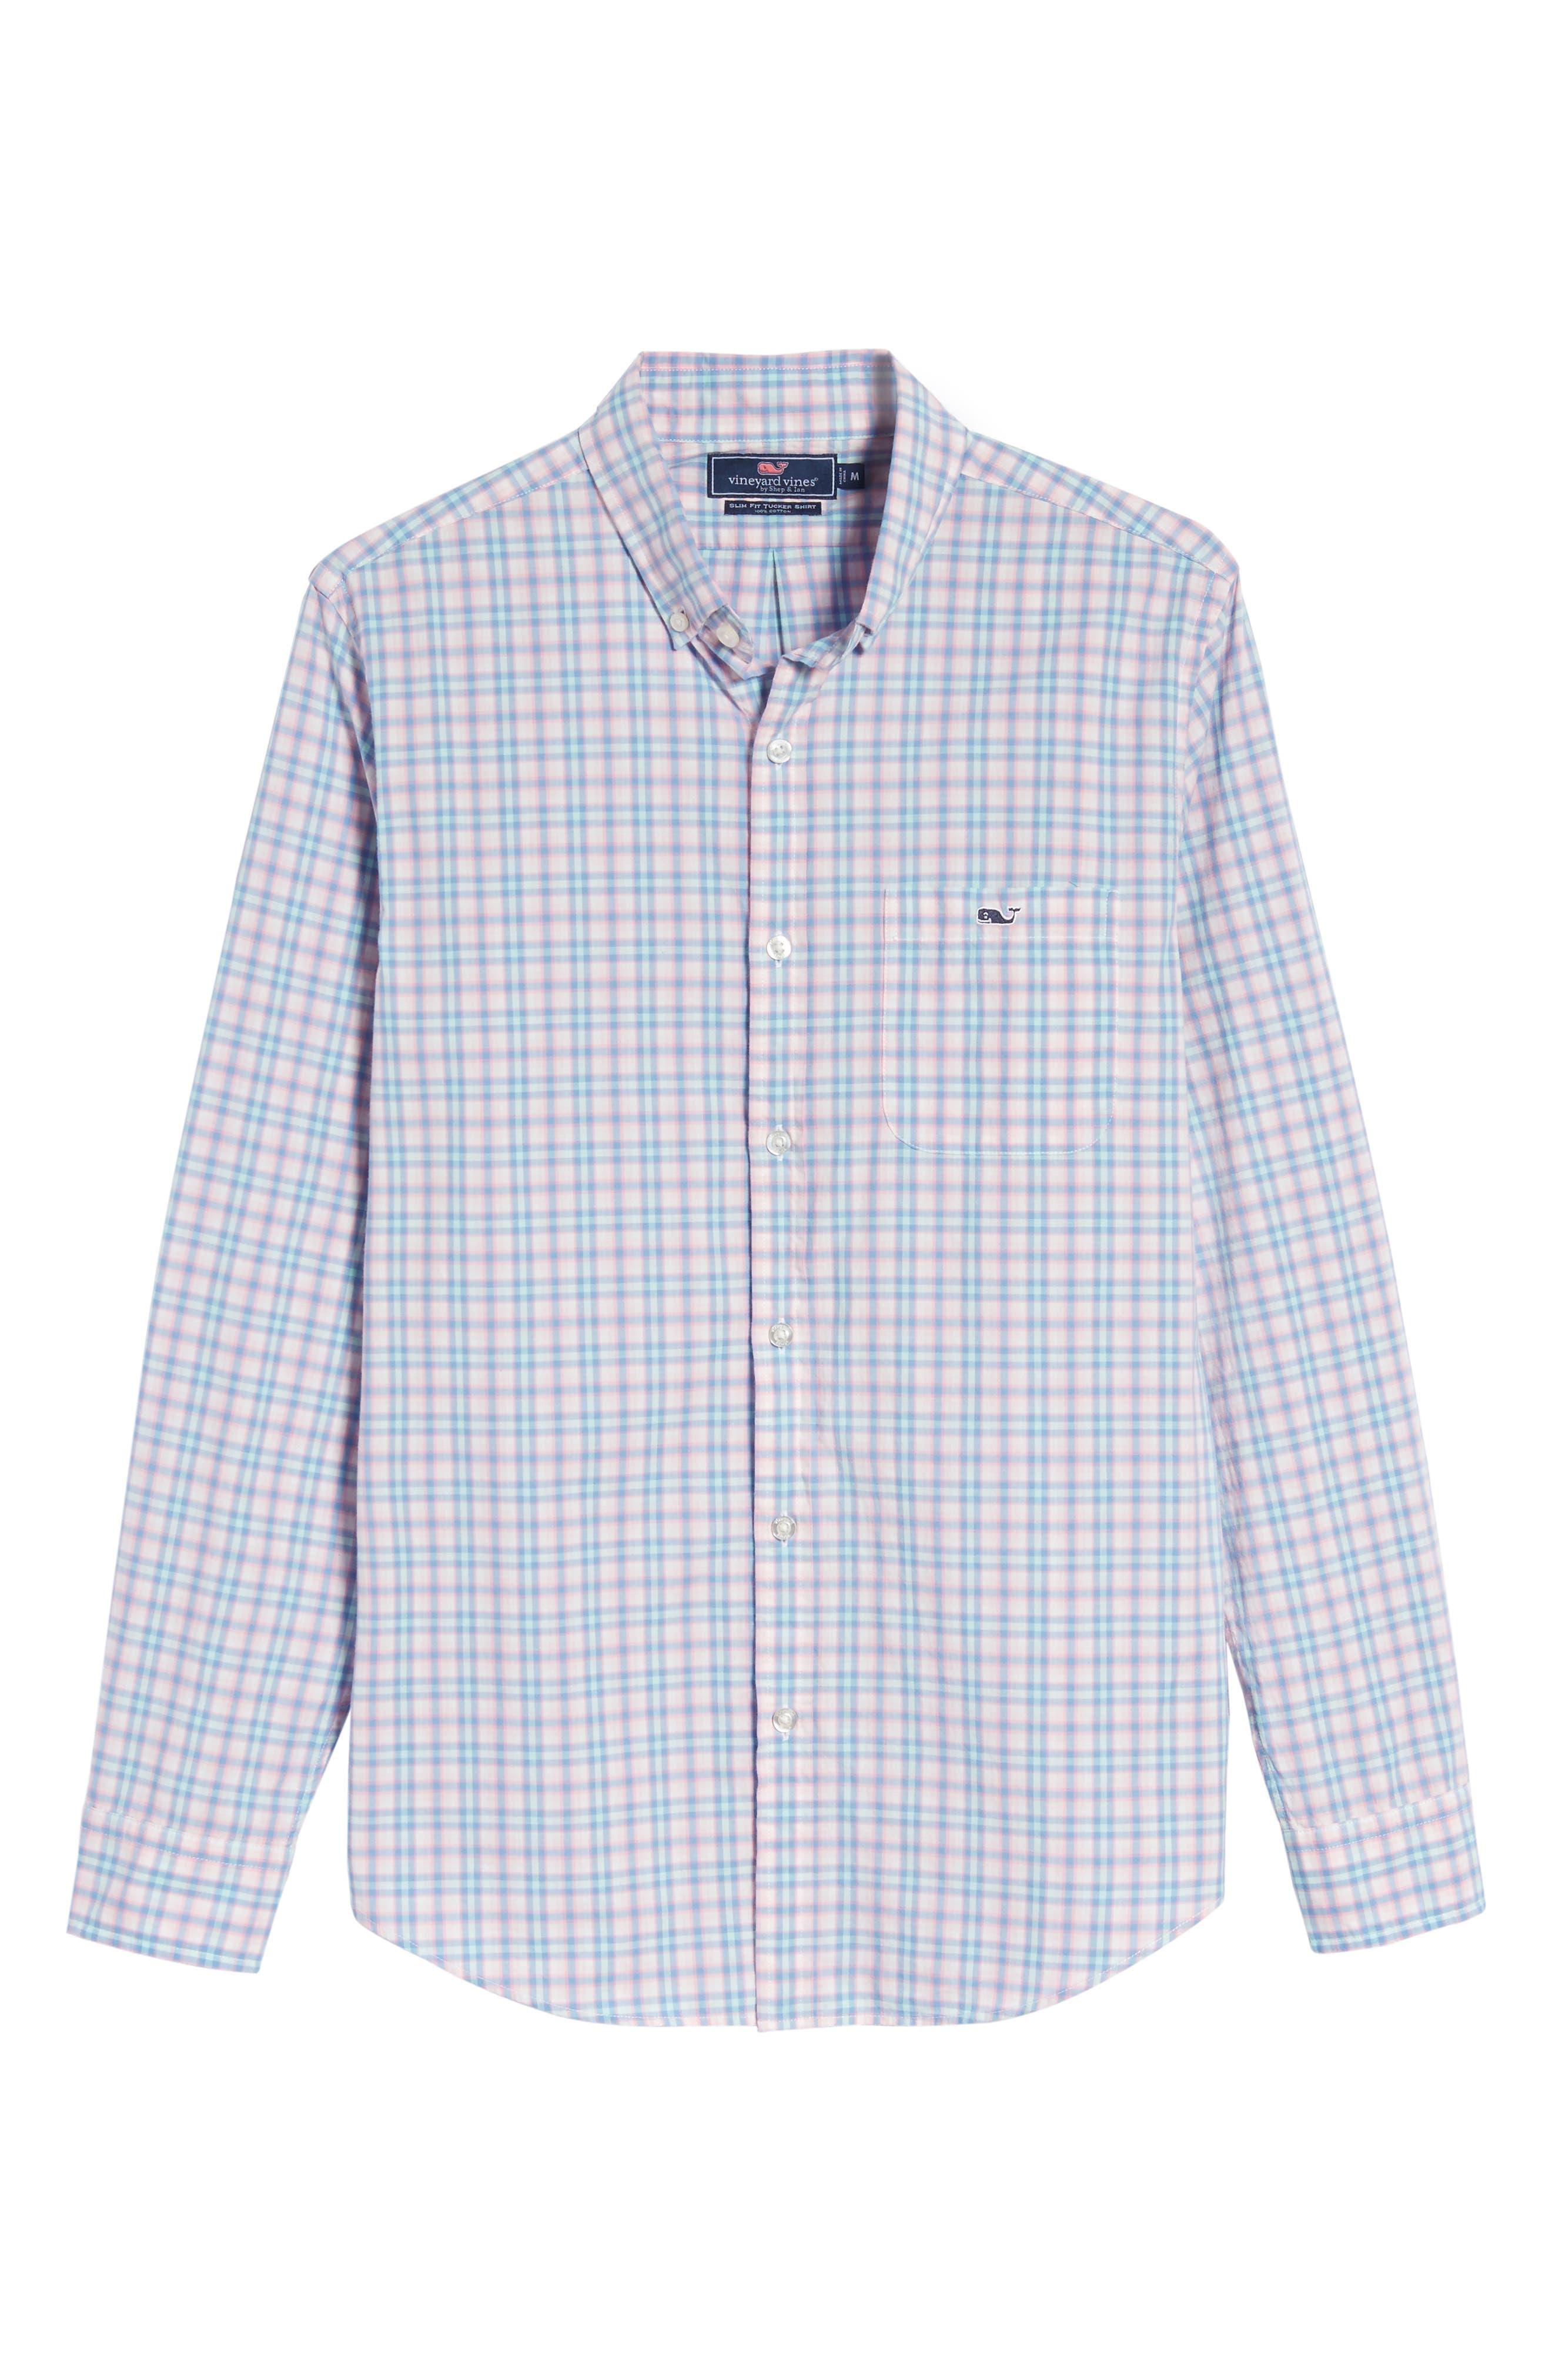 Hamlets Port Plaid Tucker Slim Fit Sport Shirt,                             Alternate thumbnail 6, color,                             Flamingo